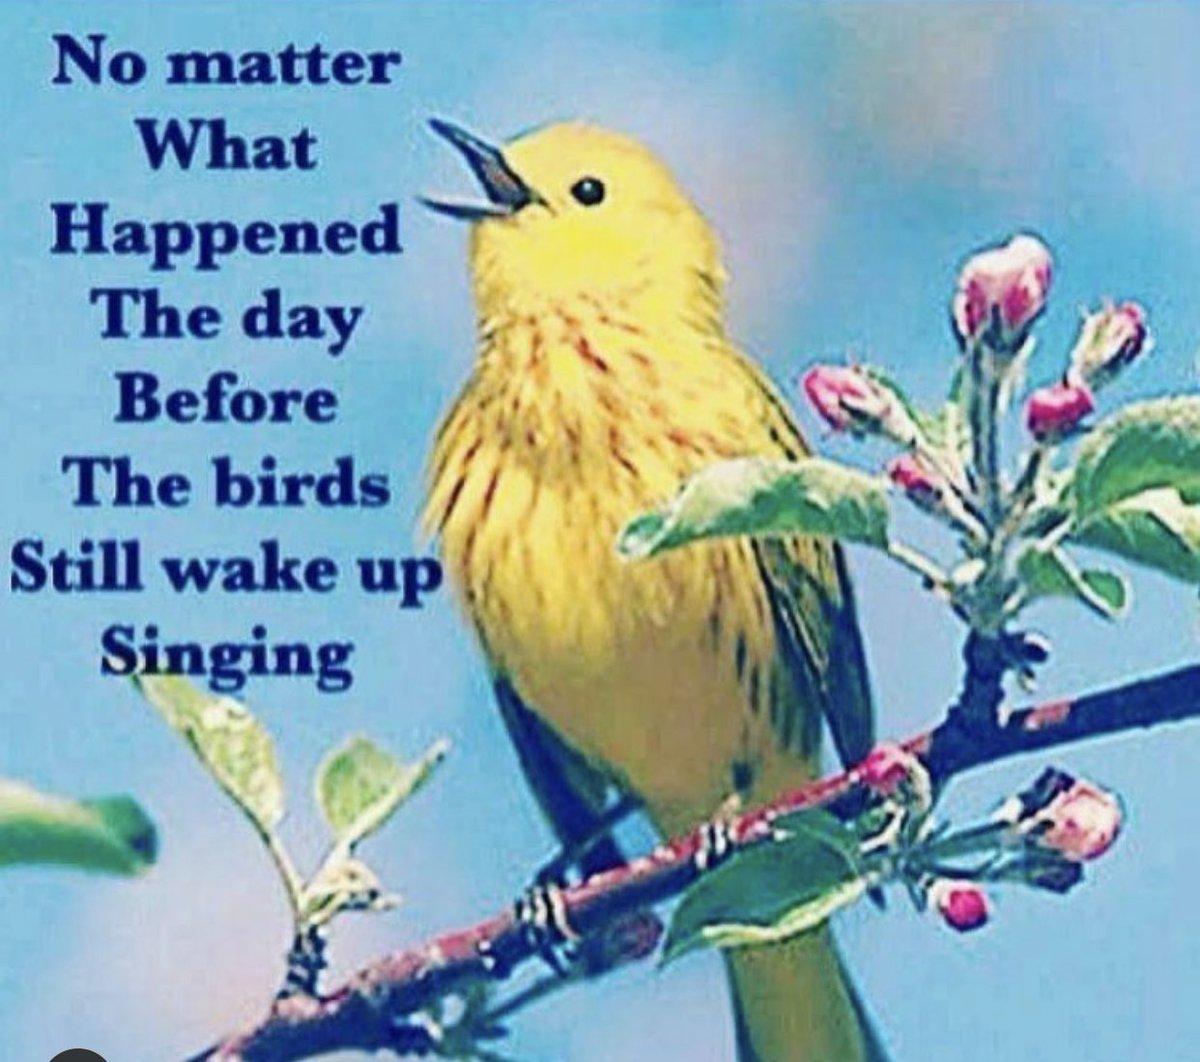 The birds still wake up singing ☀️💙💛💙☀️